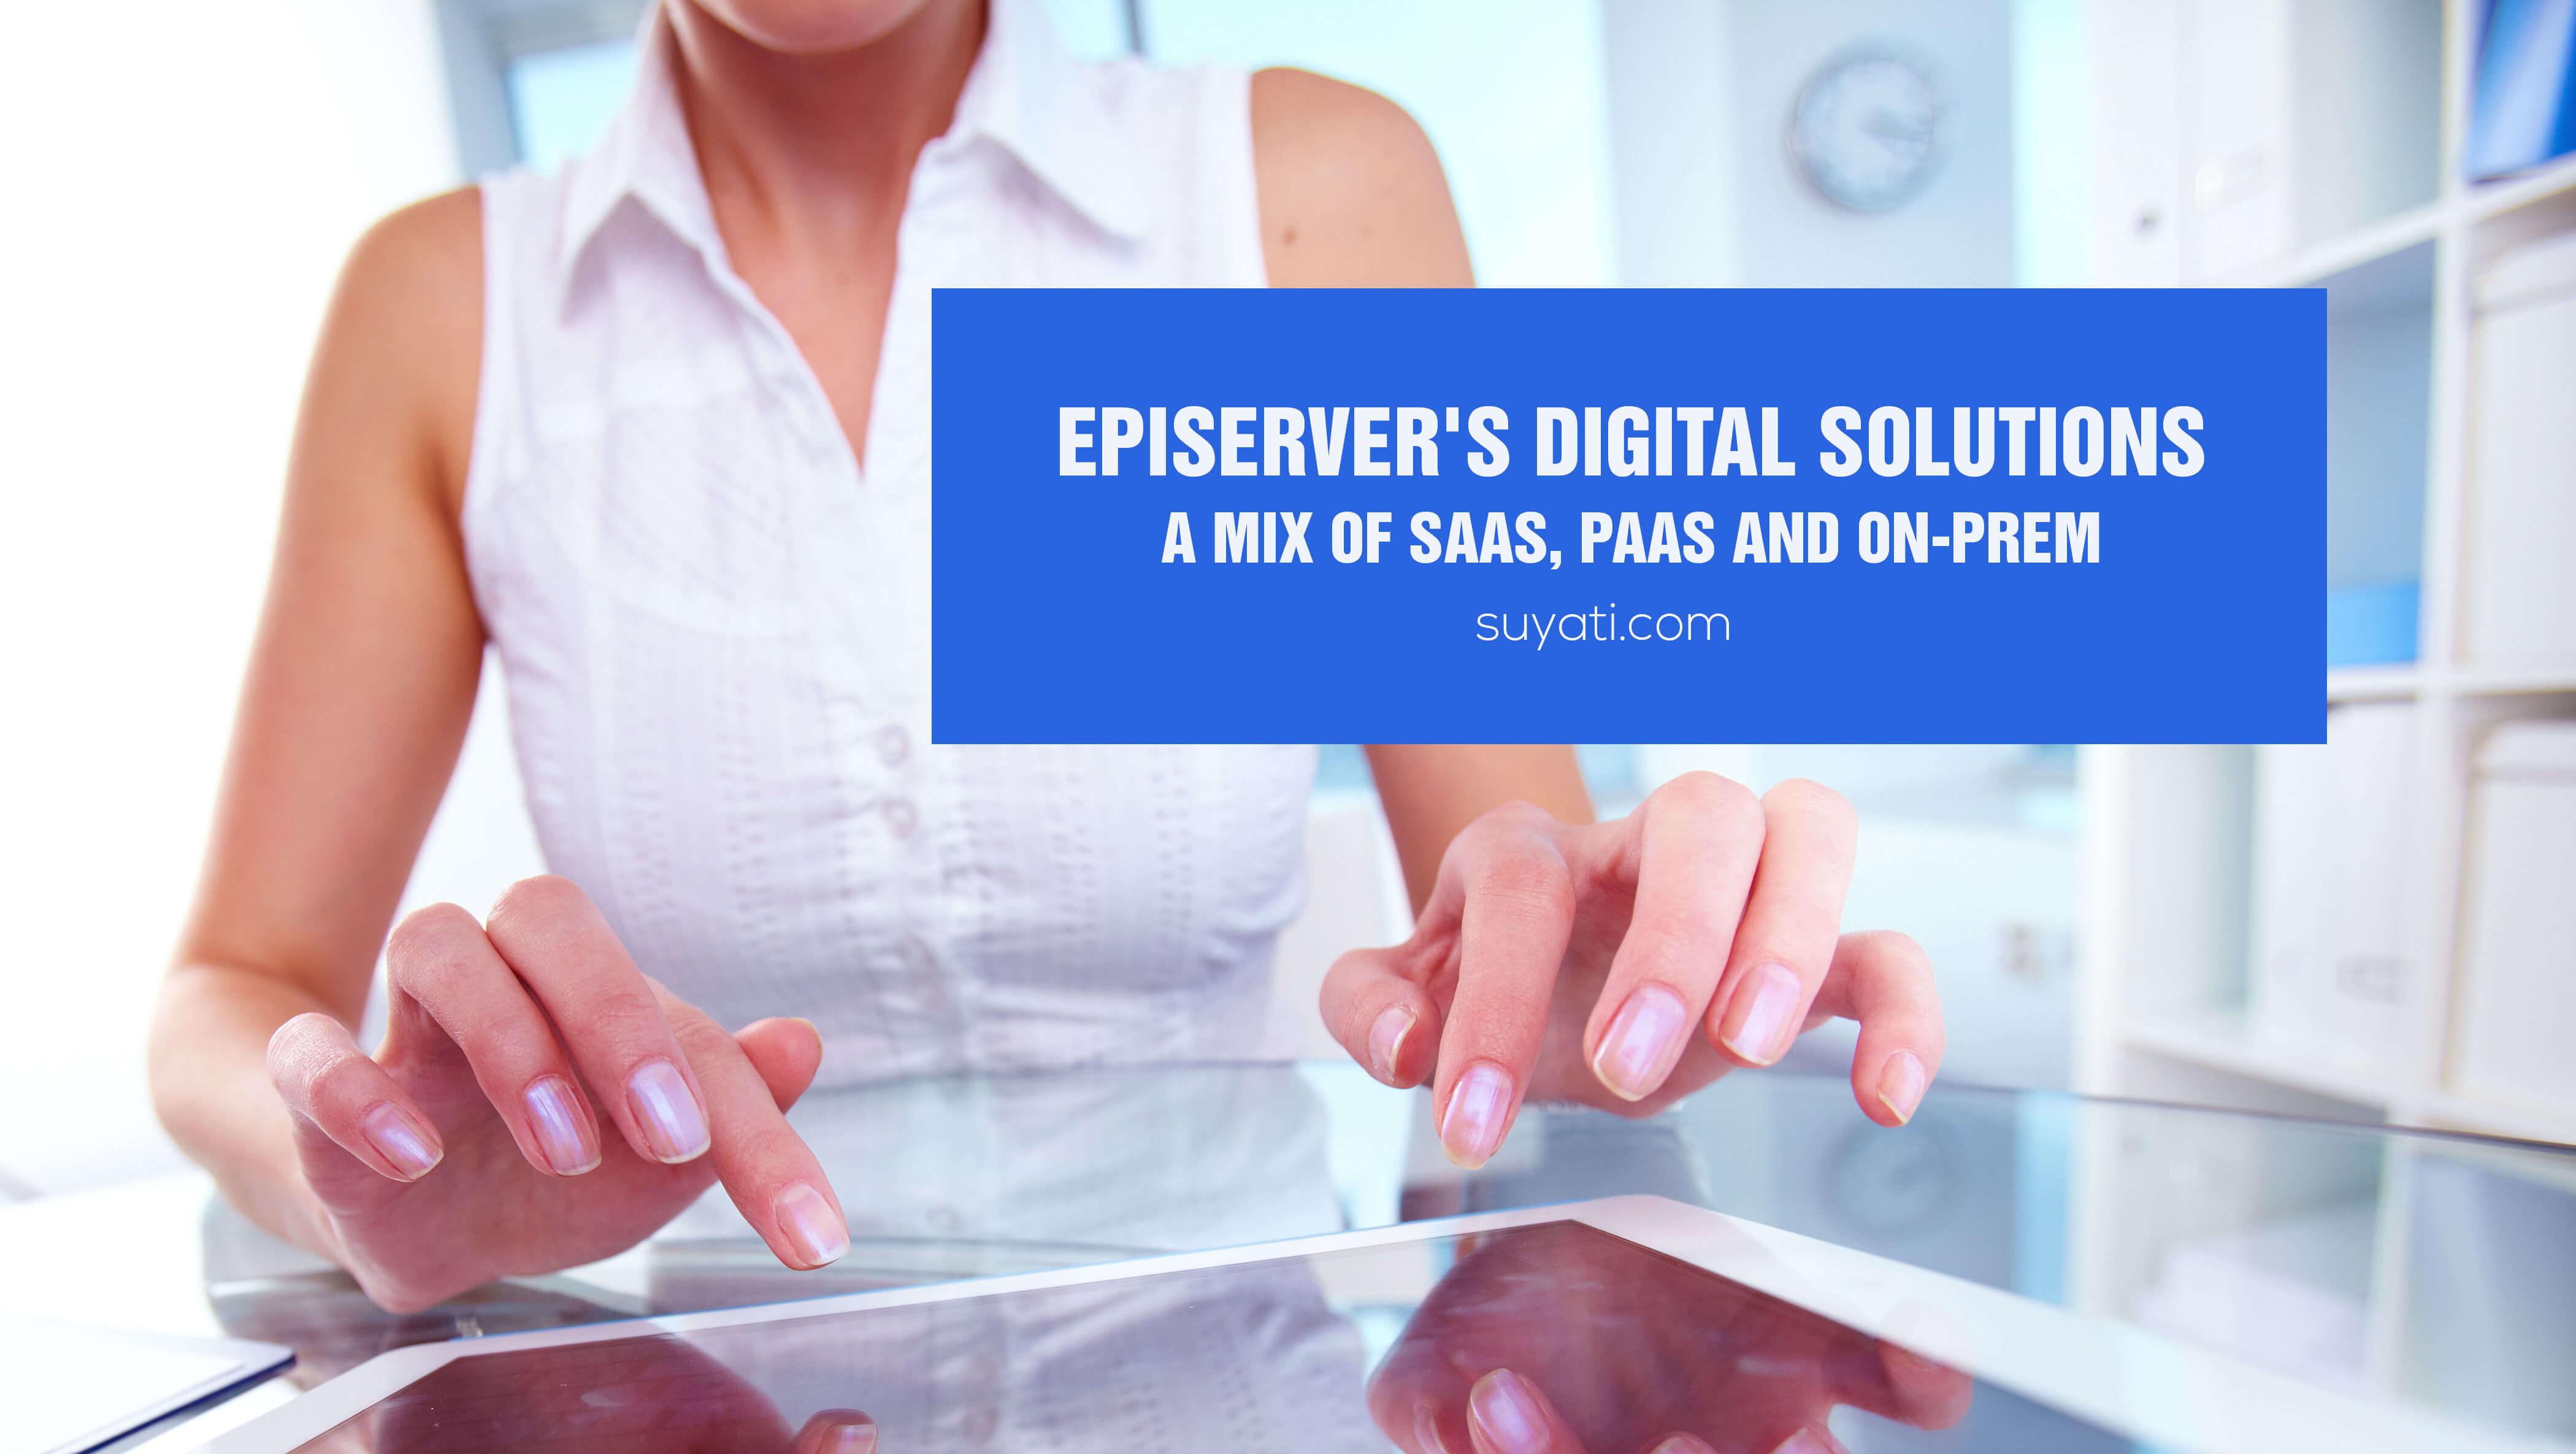 episervers-digital-solutions